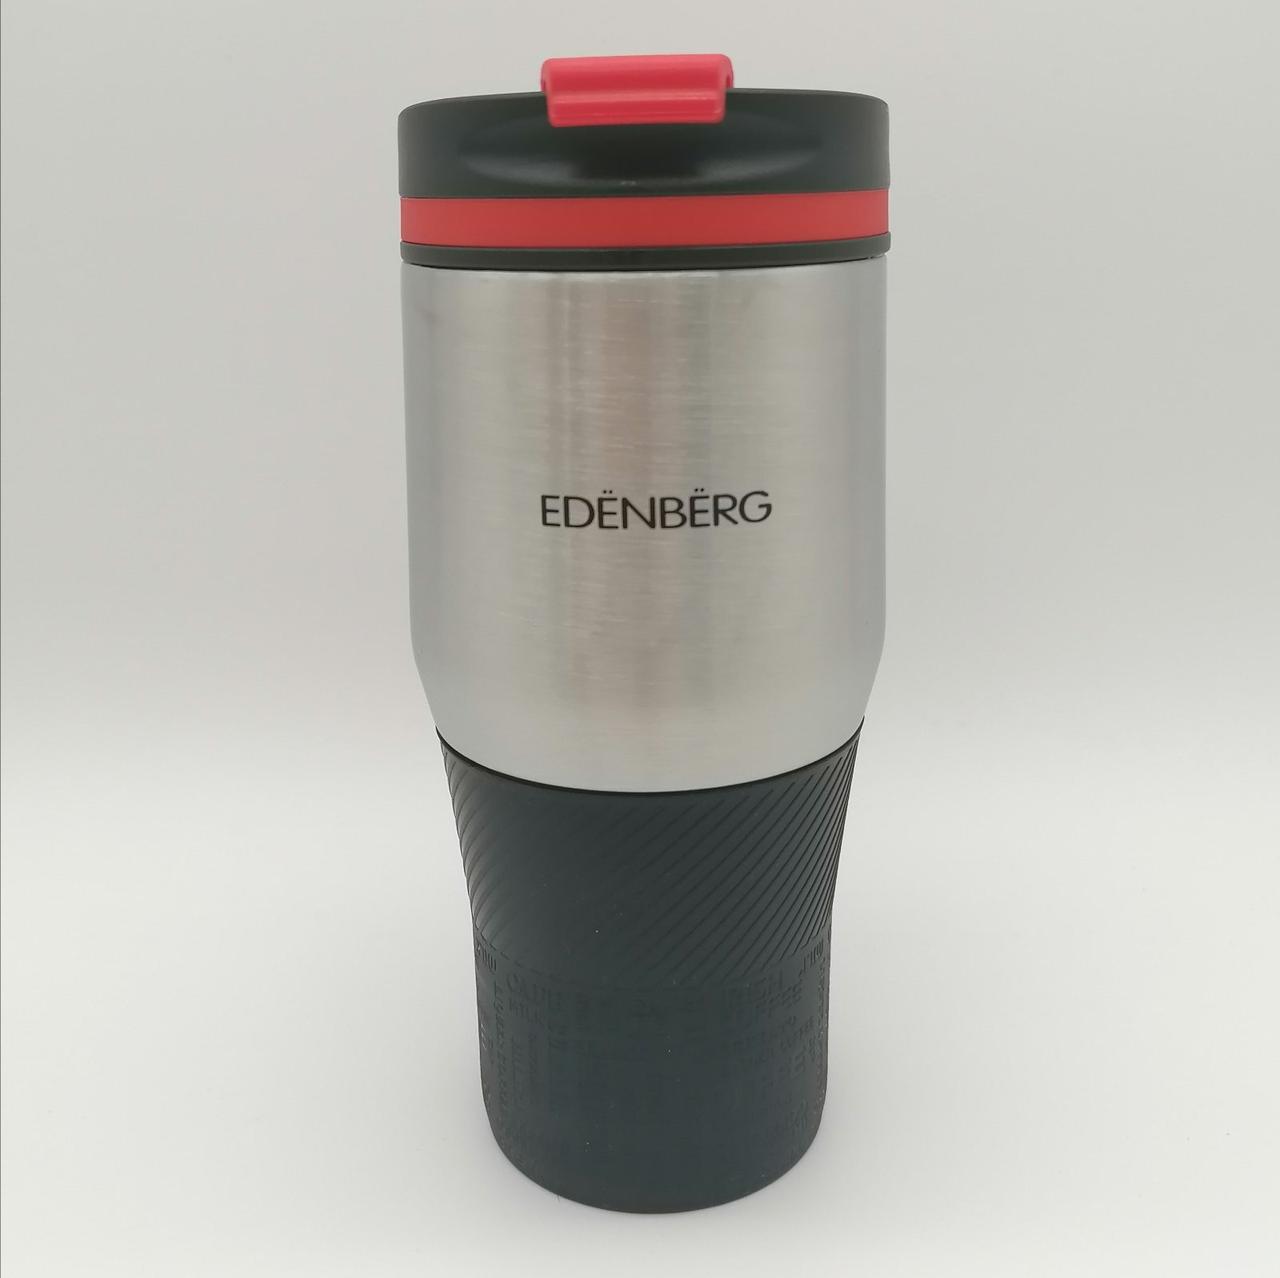 Термокружка Edenberg EB-631-2 кружка-термос 380 мл черная